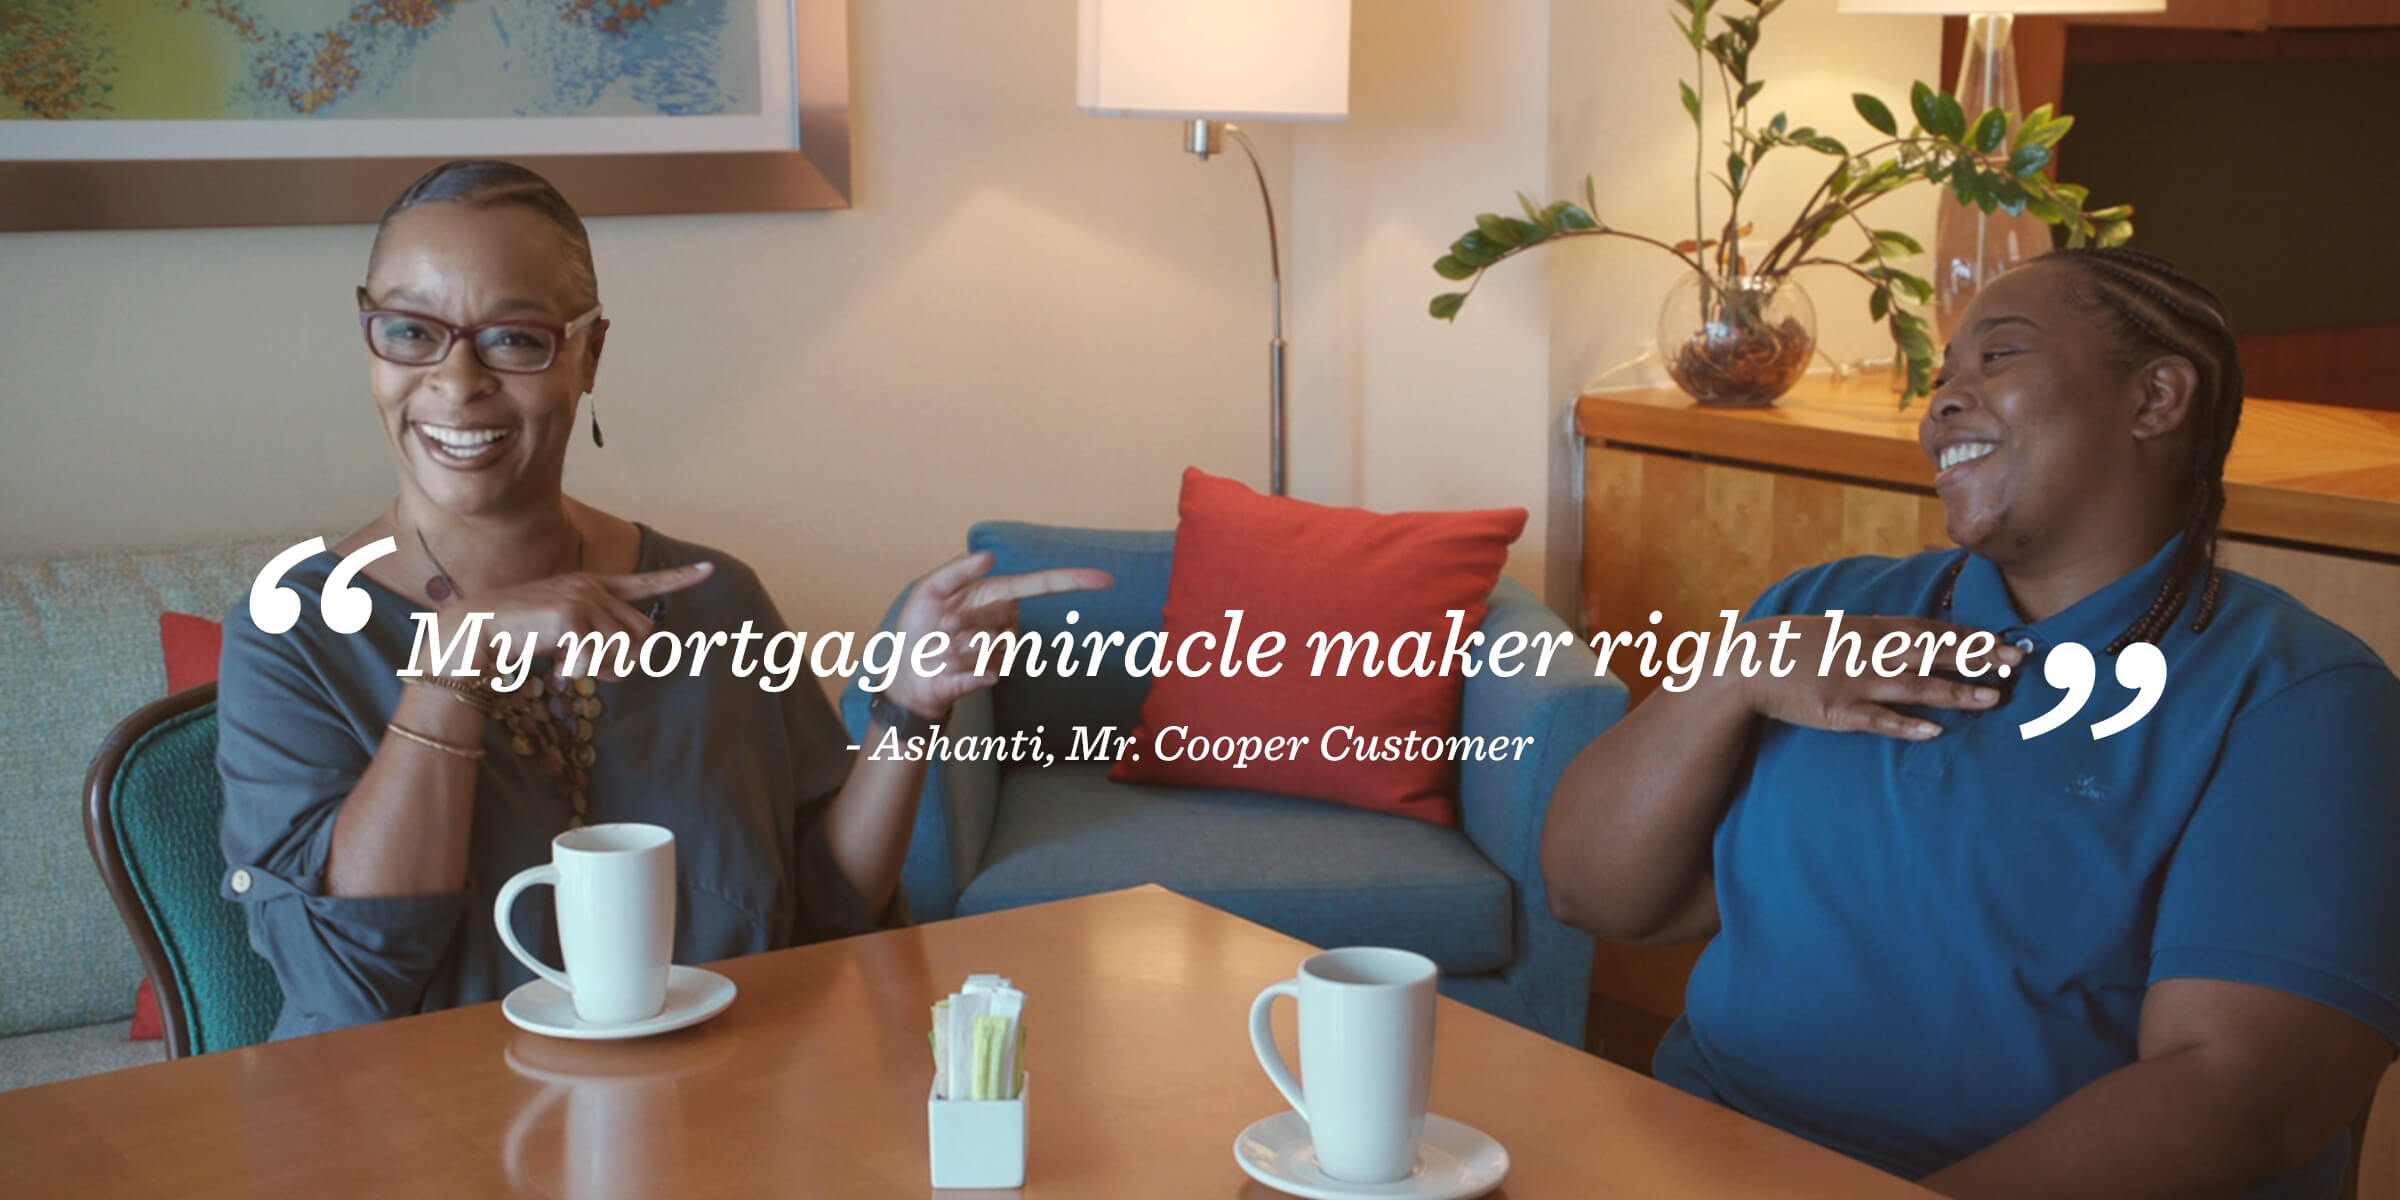 Ashanti's testimonial for Mr. Cooper